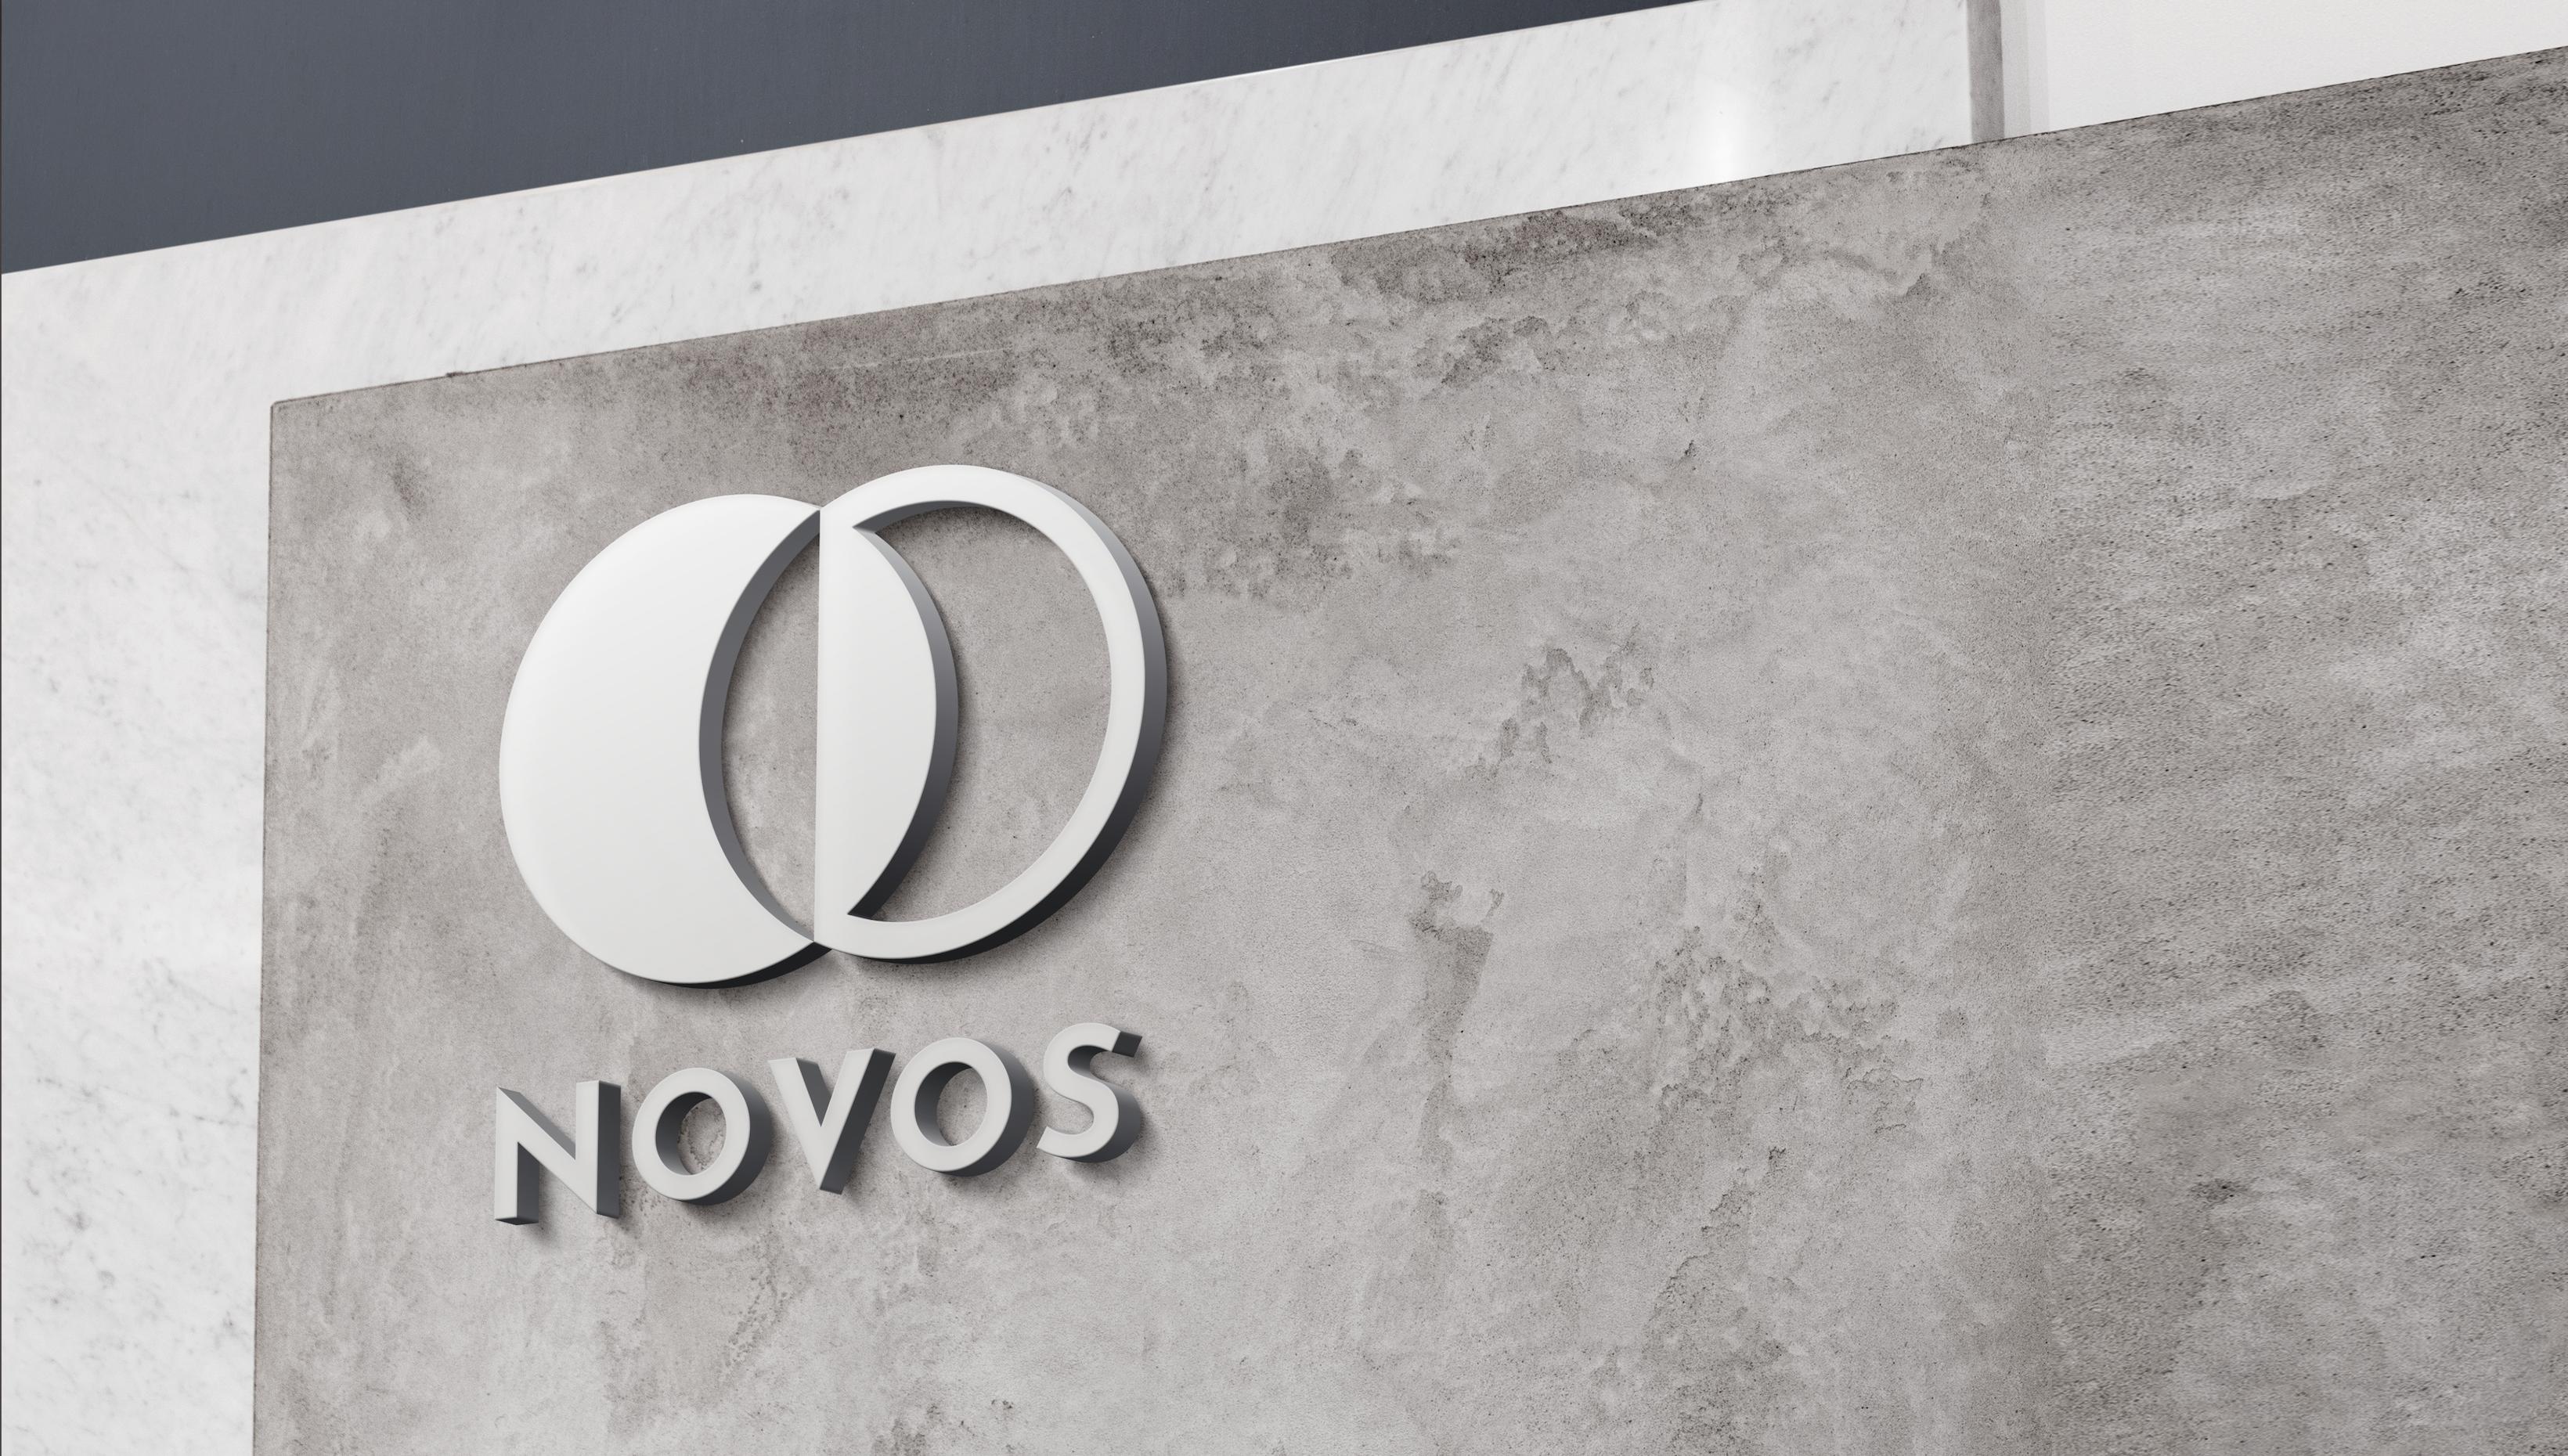 NOVOS anti-aging longevity supplements